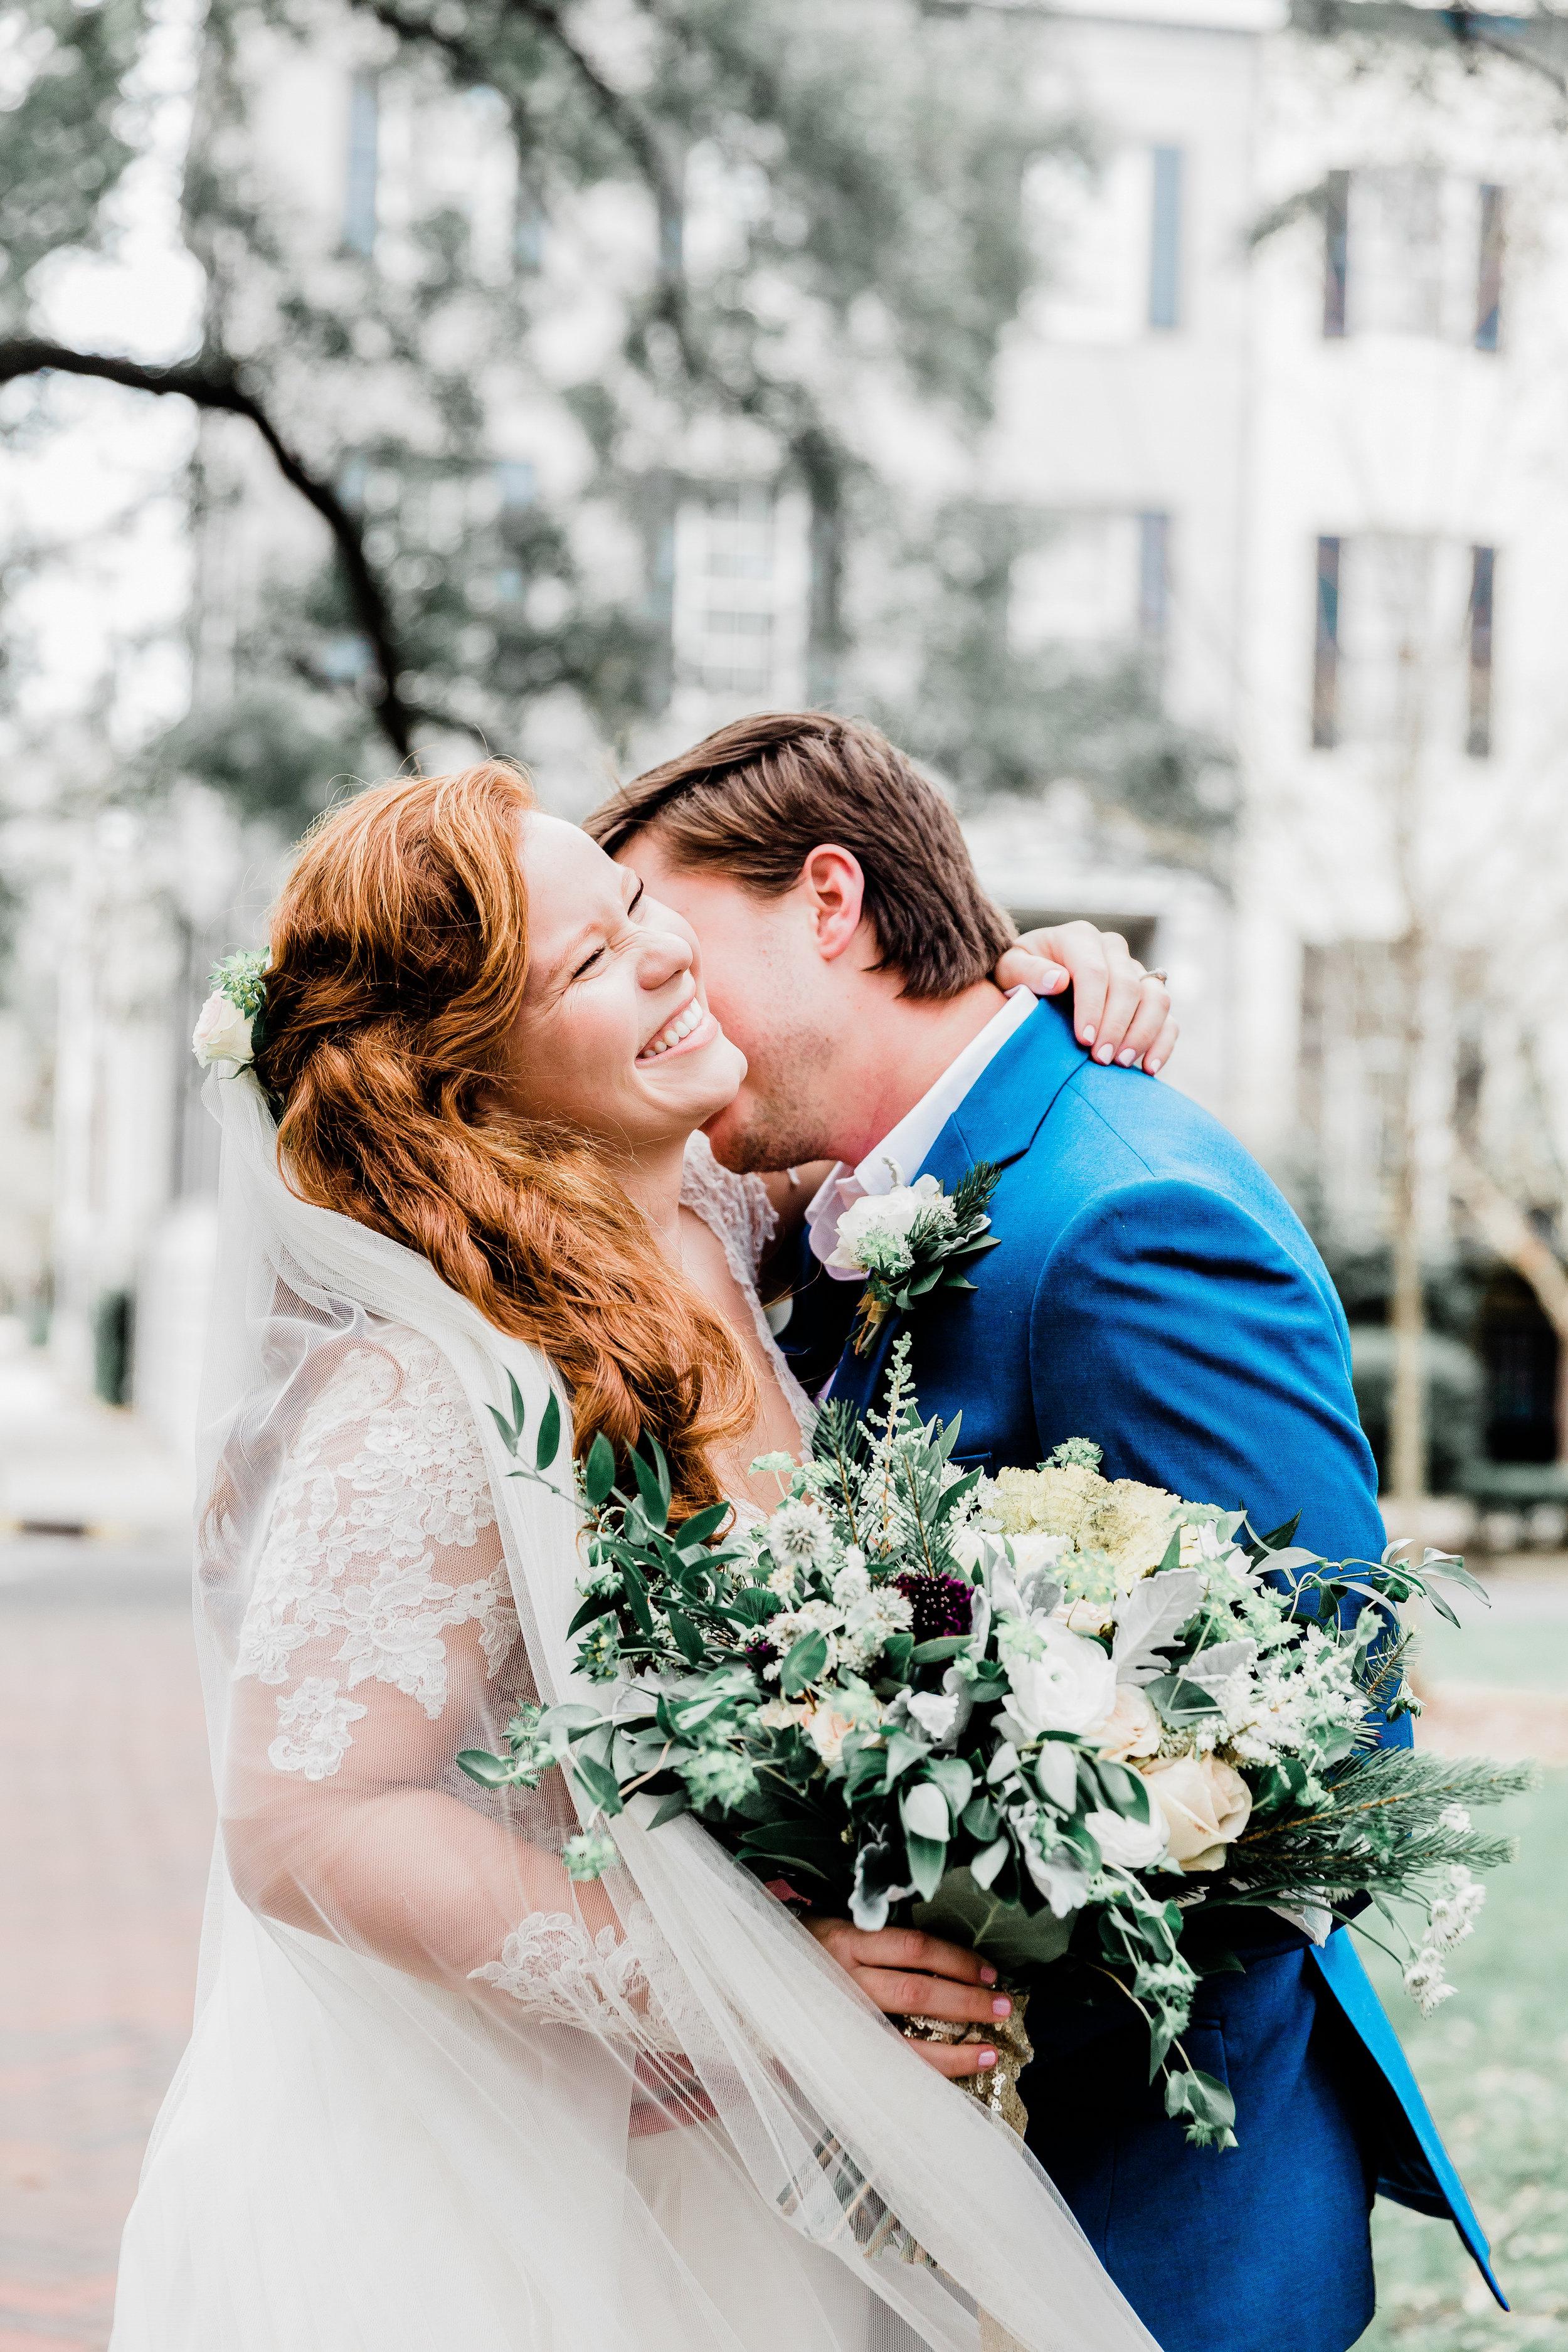 20190112-Georgia-Southern Lens Photography-Savannah Photographer-downtown savannah-savannah wedding photographer-savannah family photographer-georgia photographer237.jpg